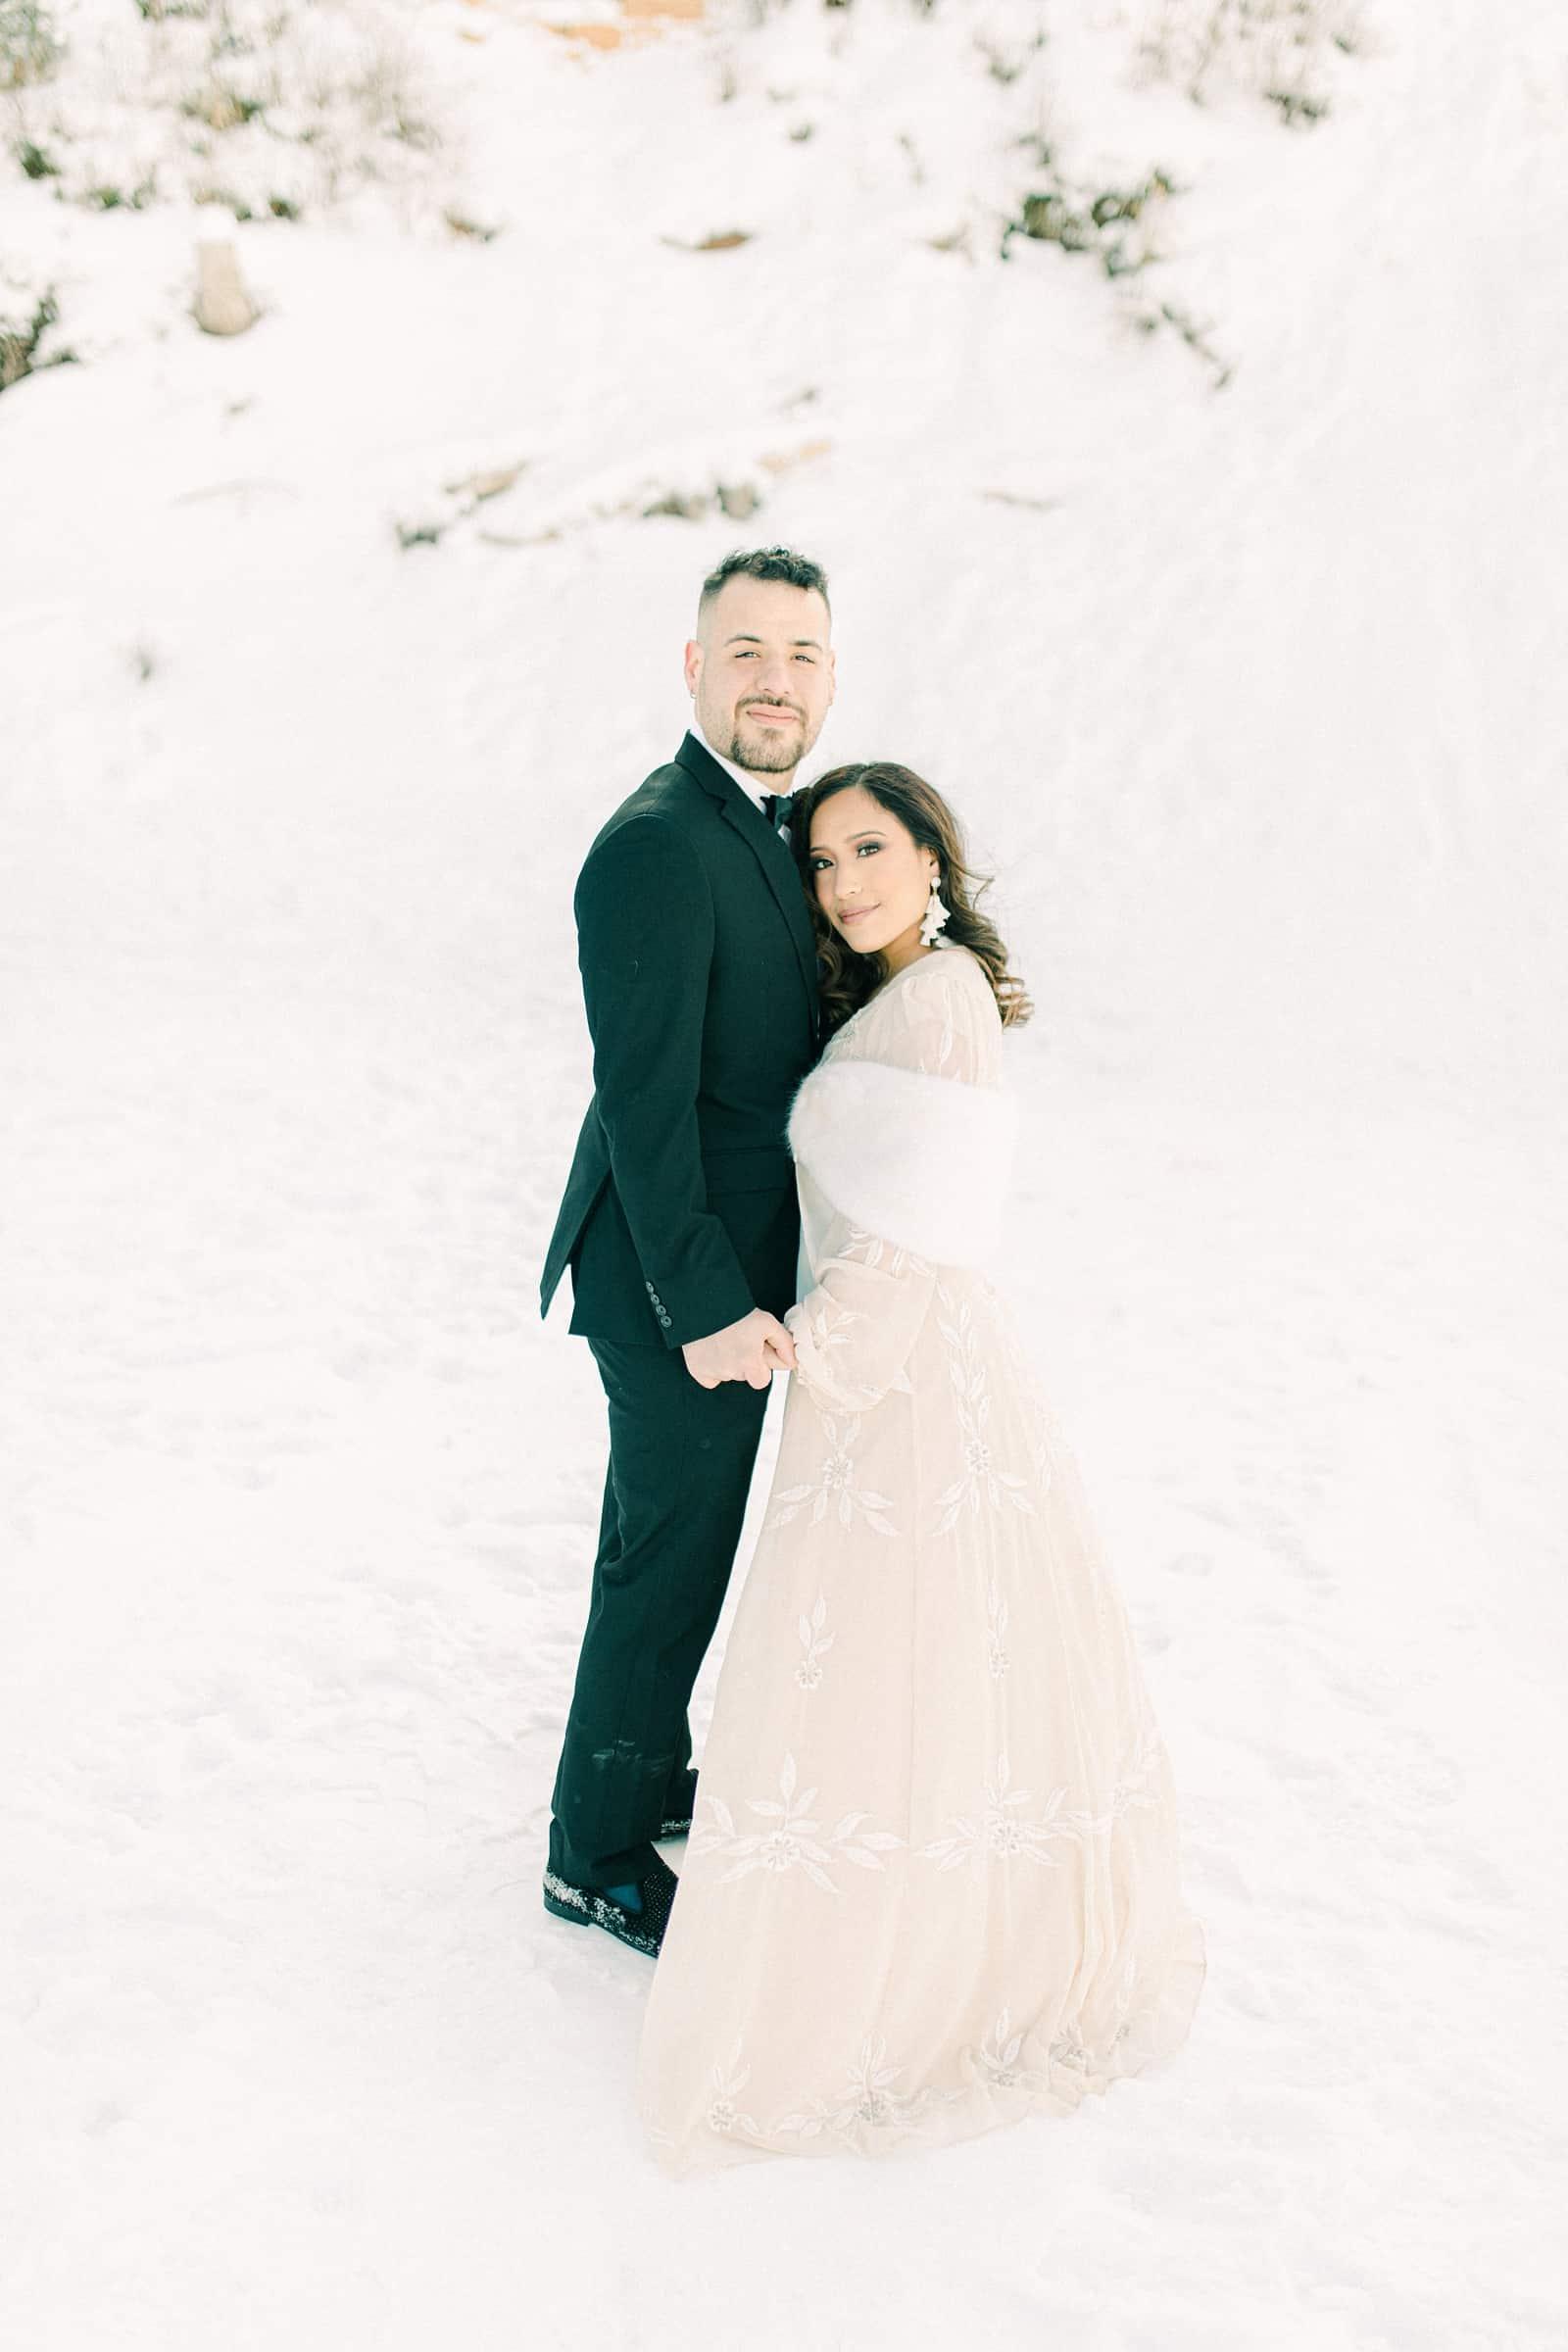 Winter bride and groom, winter wedding